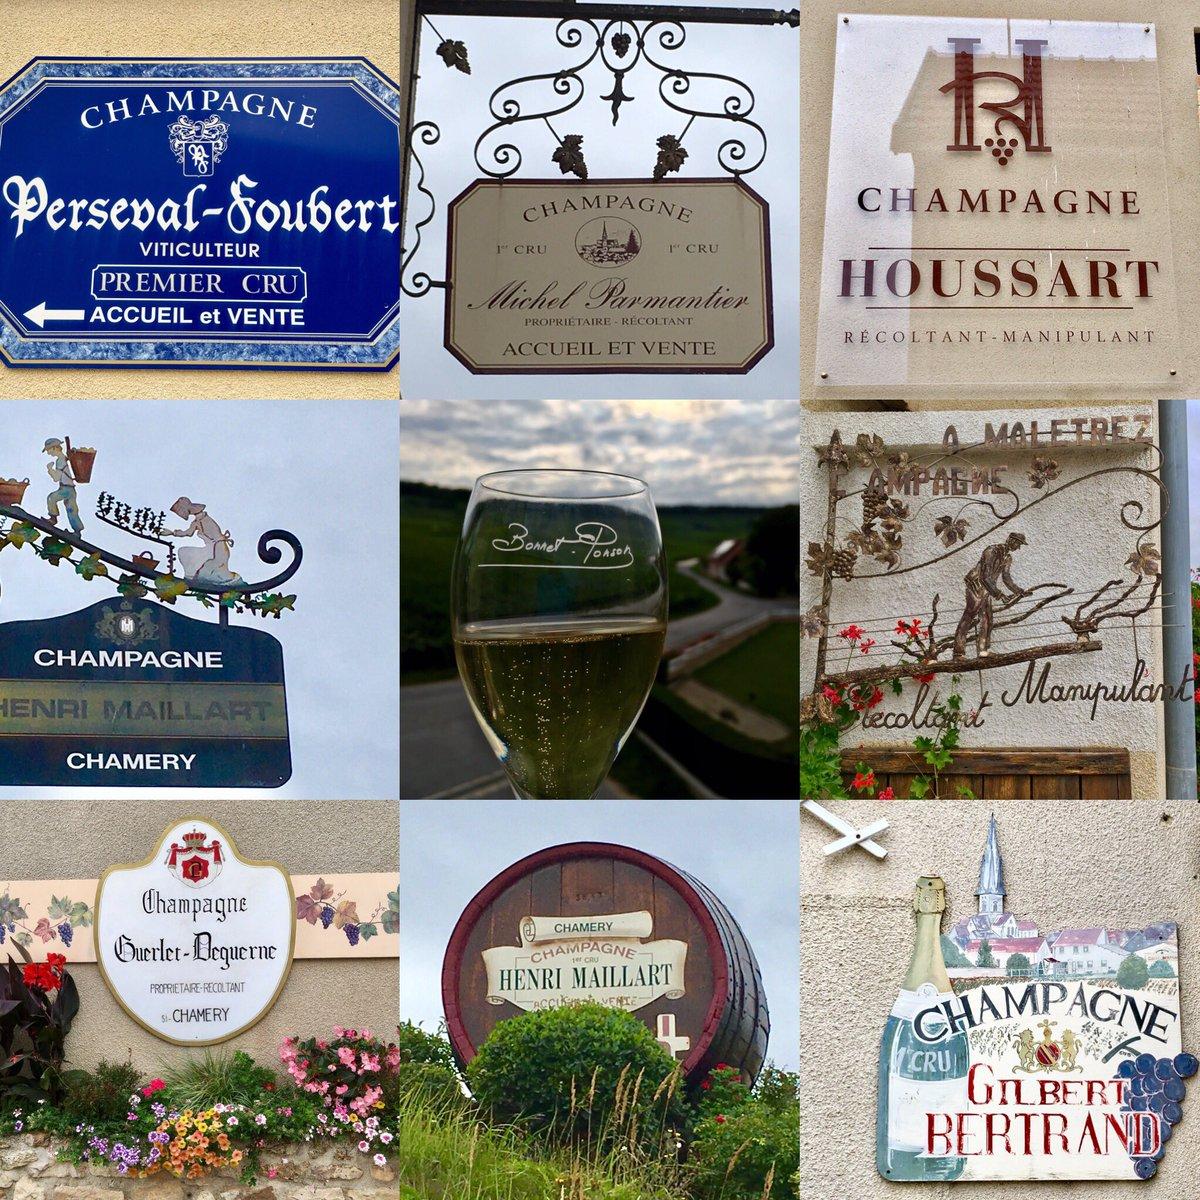 A leisurely stroll round #chamery reveals all the #champagne houses @500pxrtg #Reims @BonnetPonson <br>http://pic.twitter.com/89xGJixZeS